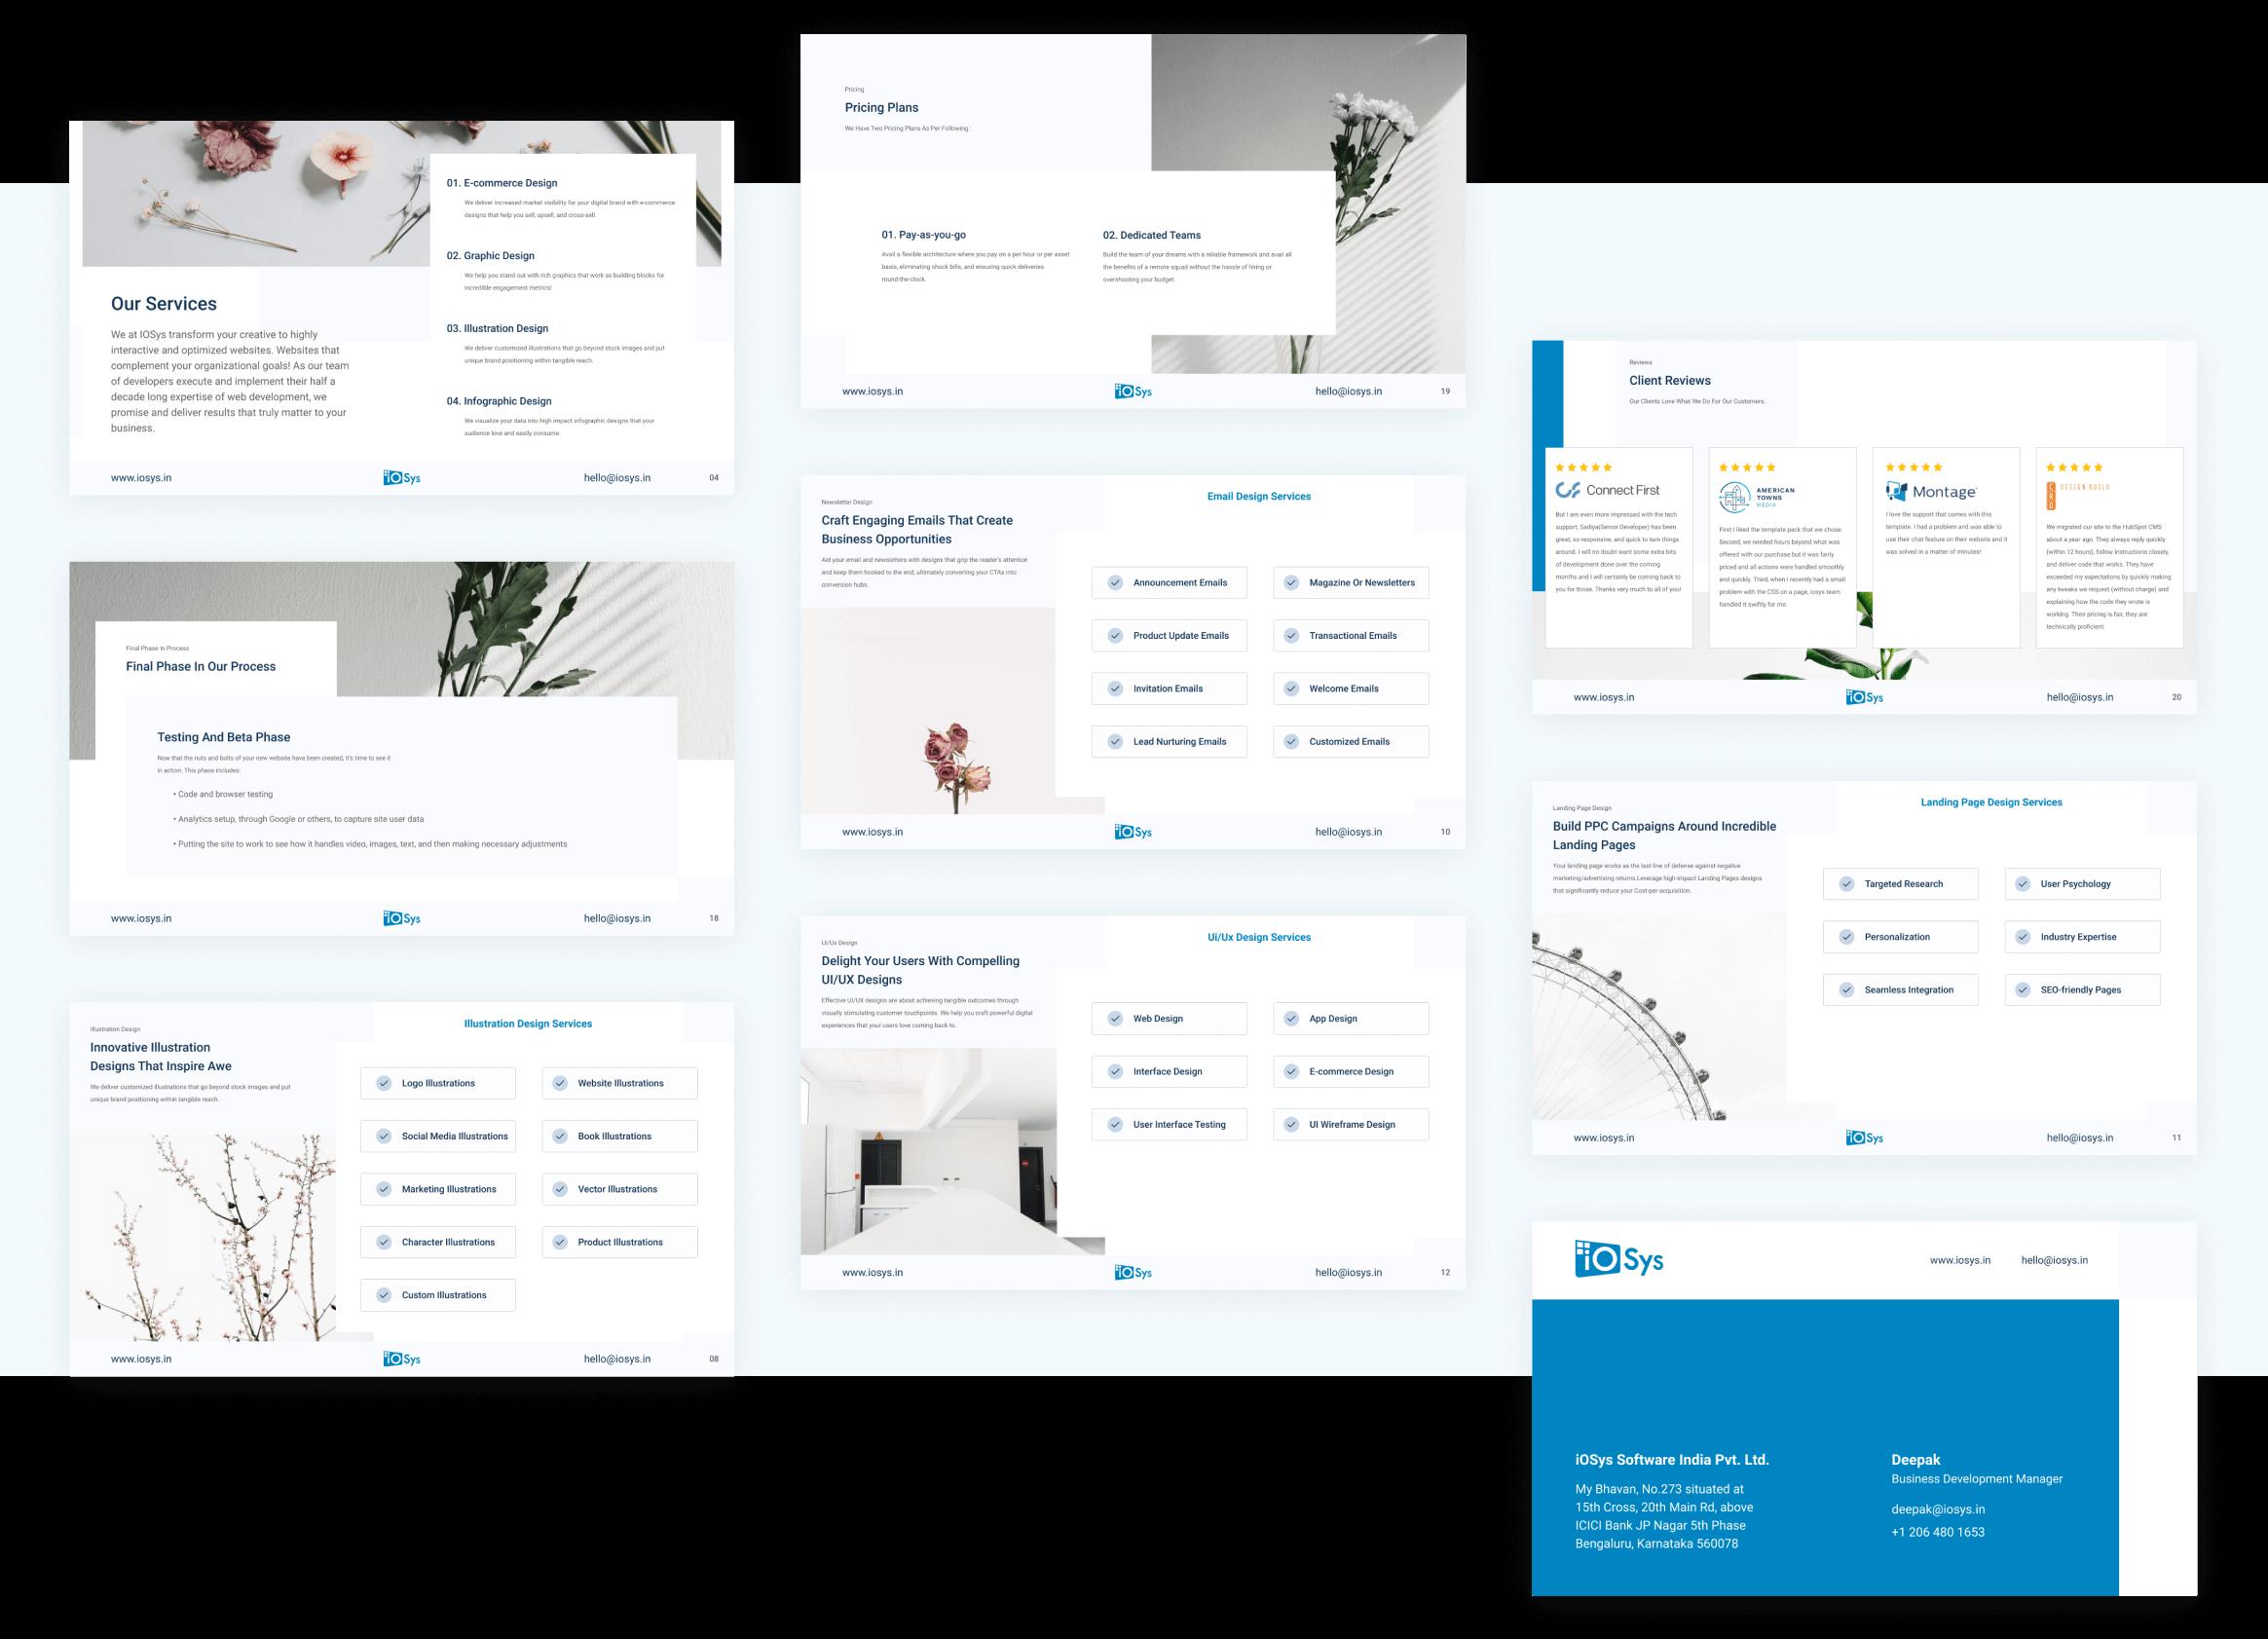 Slide Deck - iOSys Design and development by wowdesign